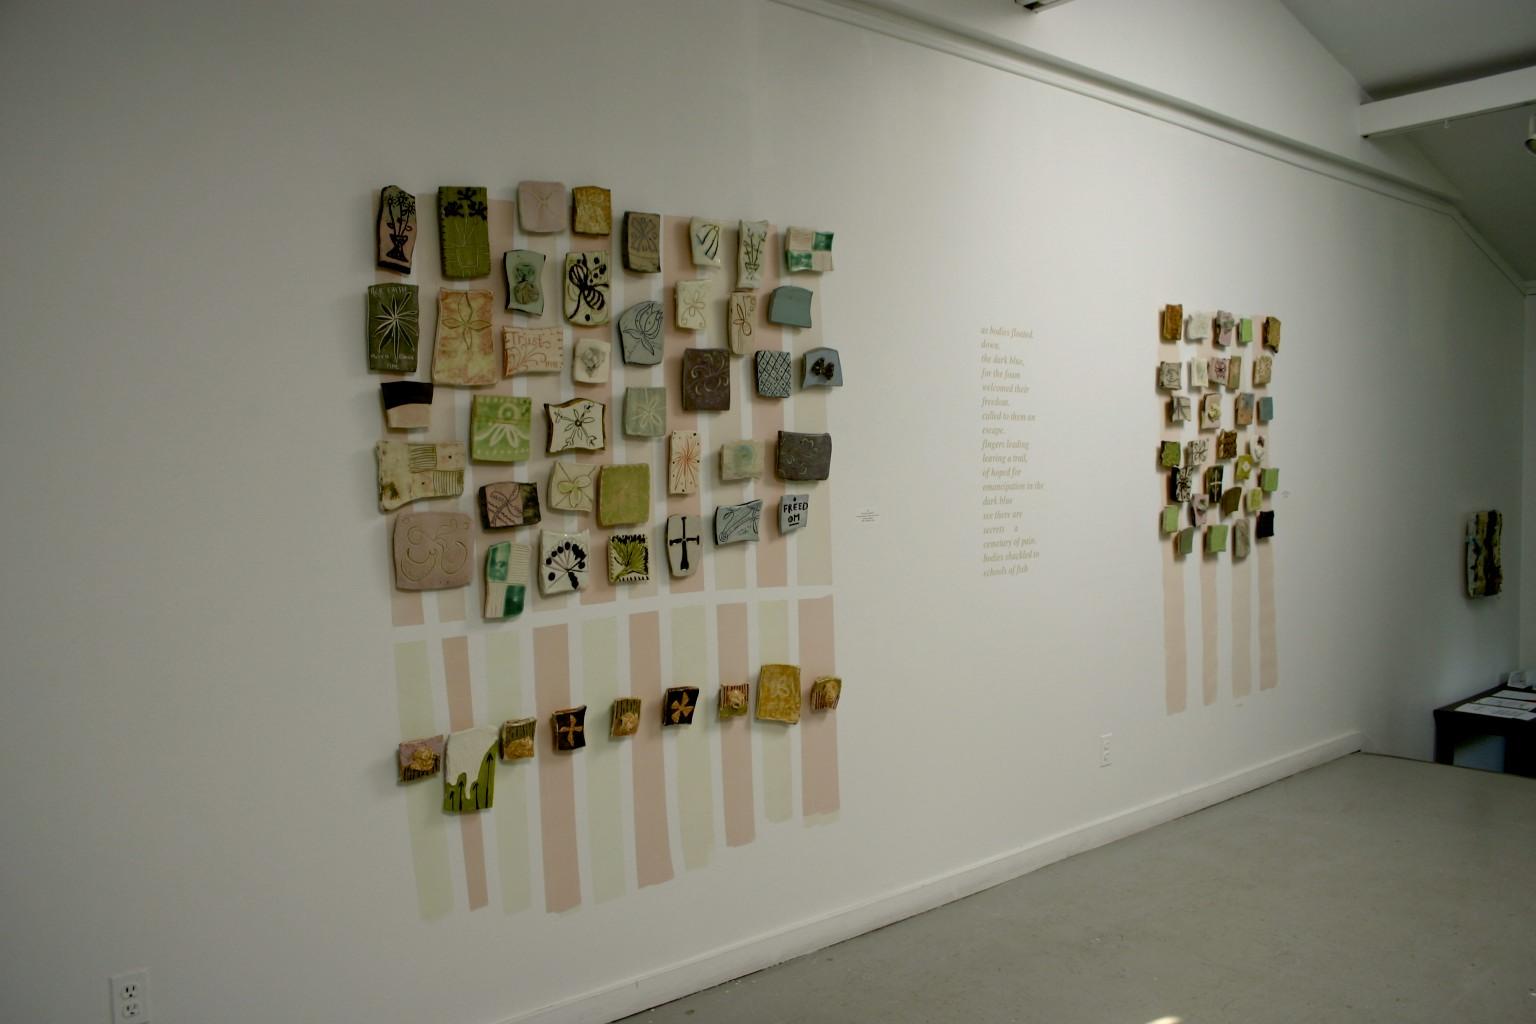 Gallery, installation view, Mikhail Zakin Gallery, Art School at Old Church, Demarest, NJ